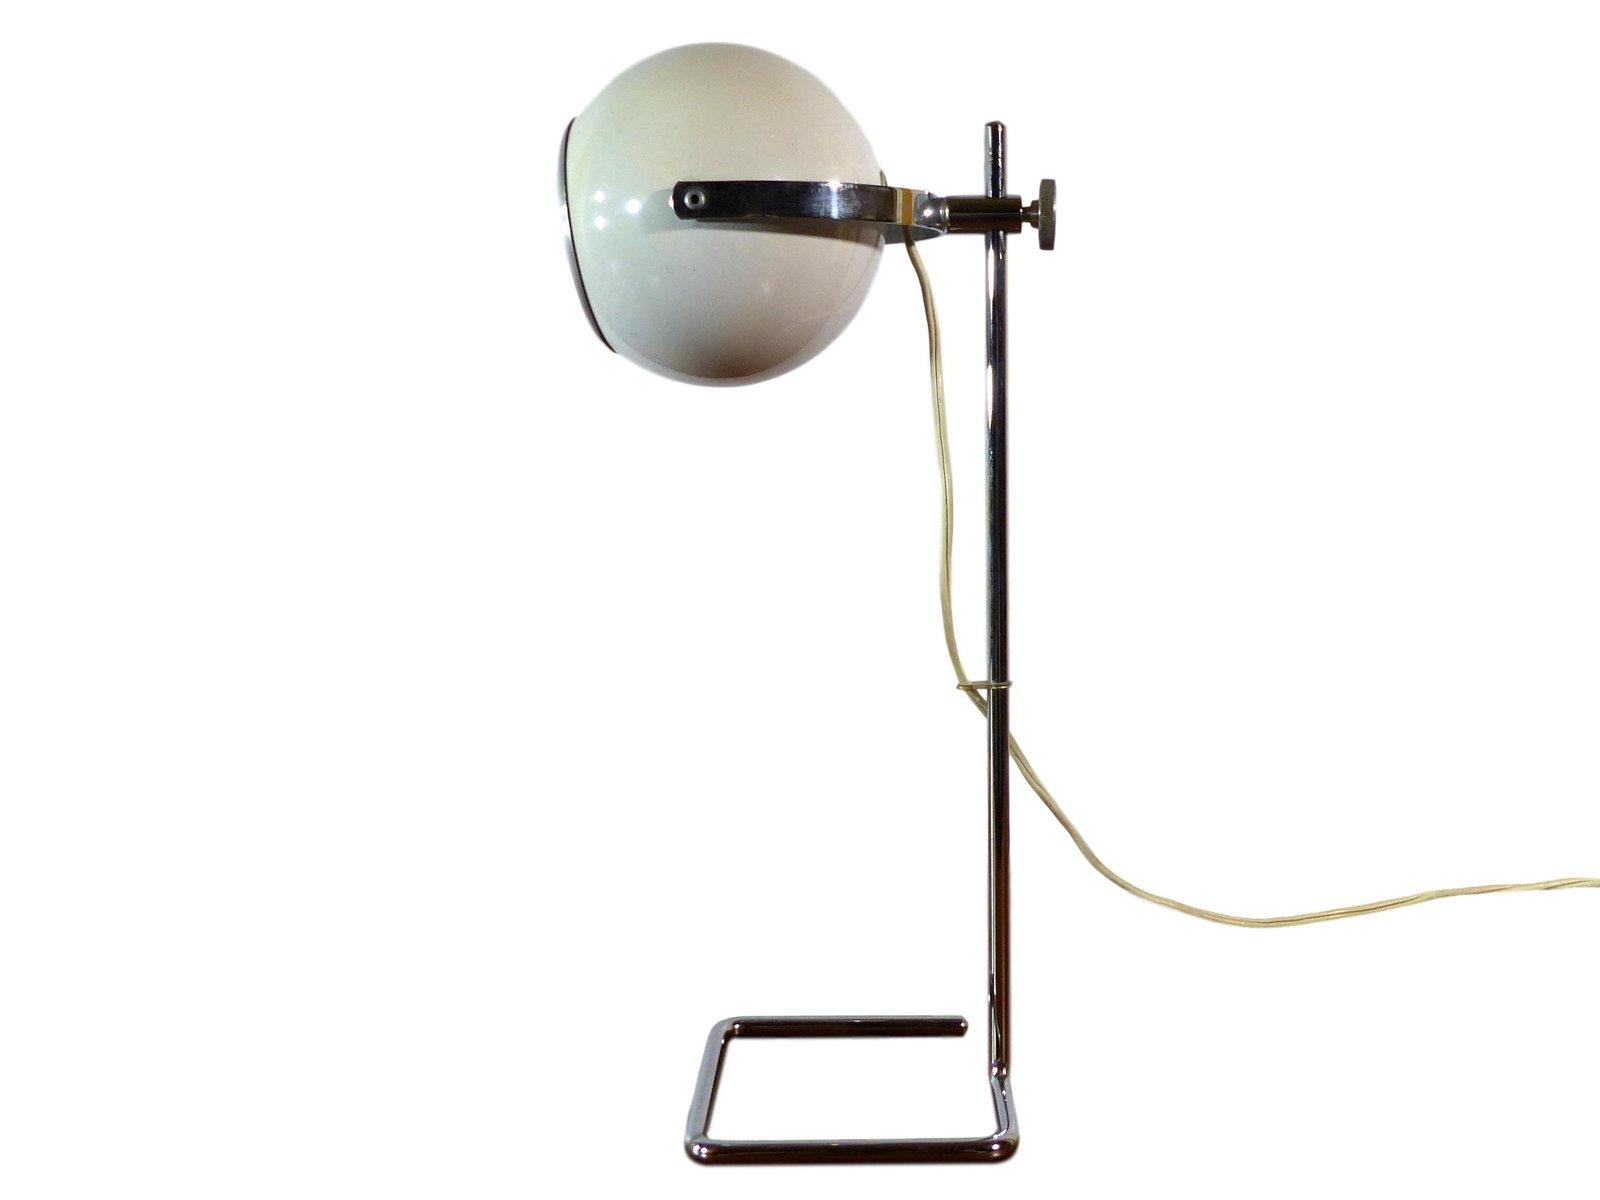 Kugelförmige weiße Lampe, 1970er